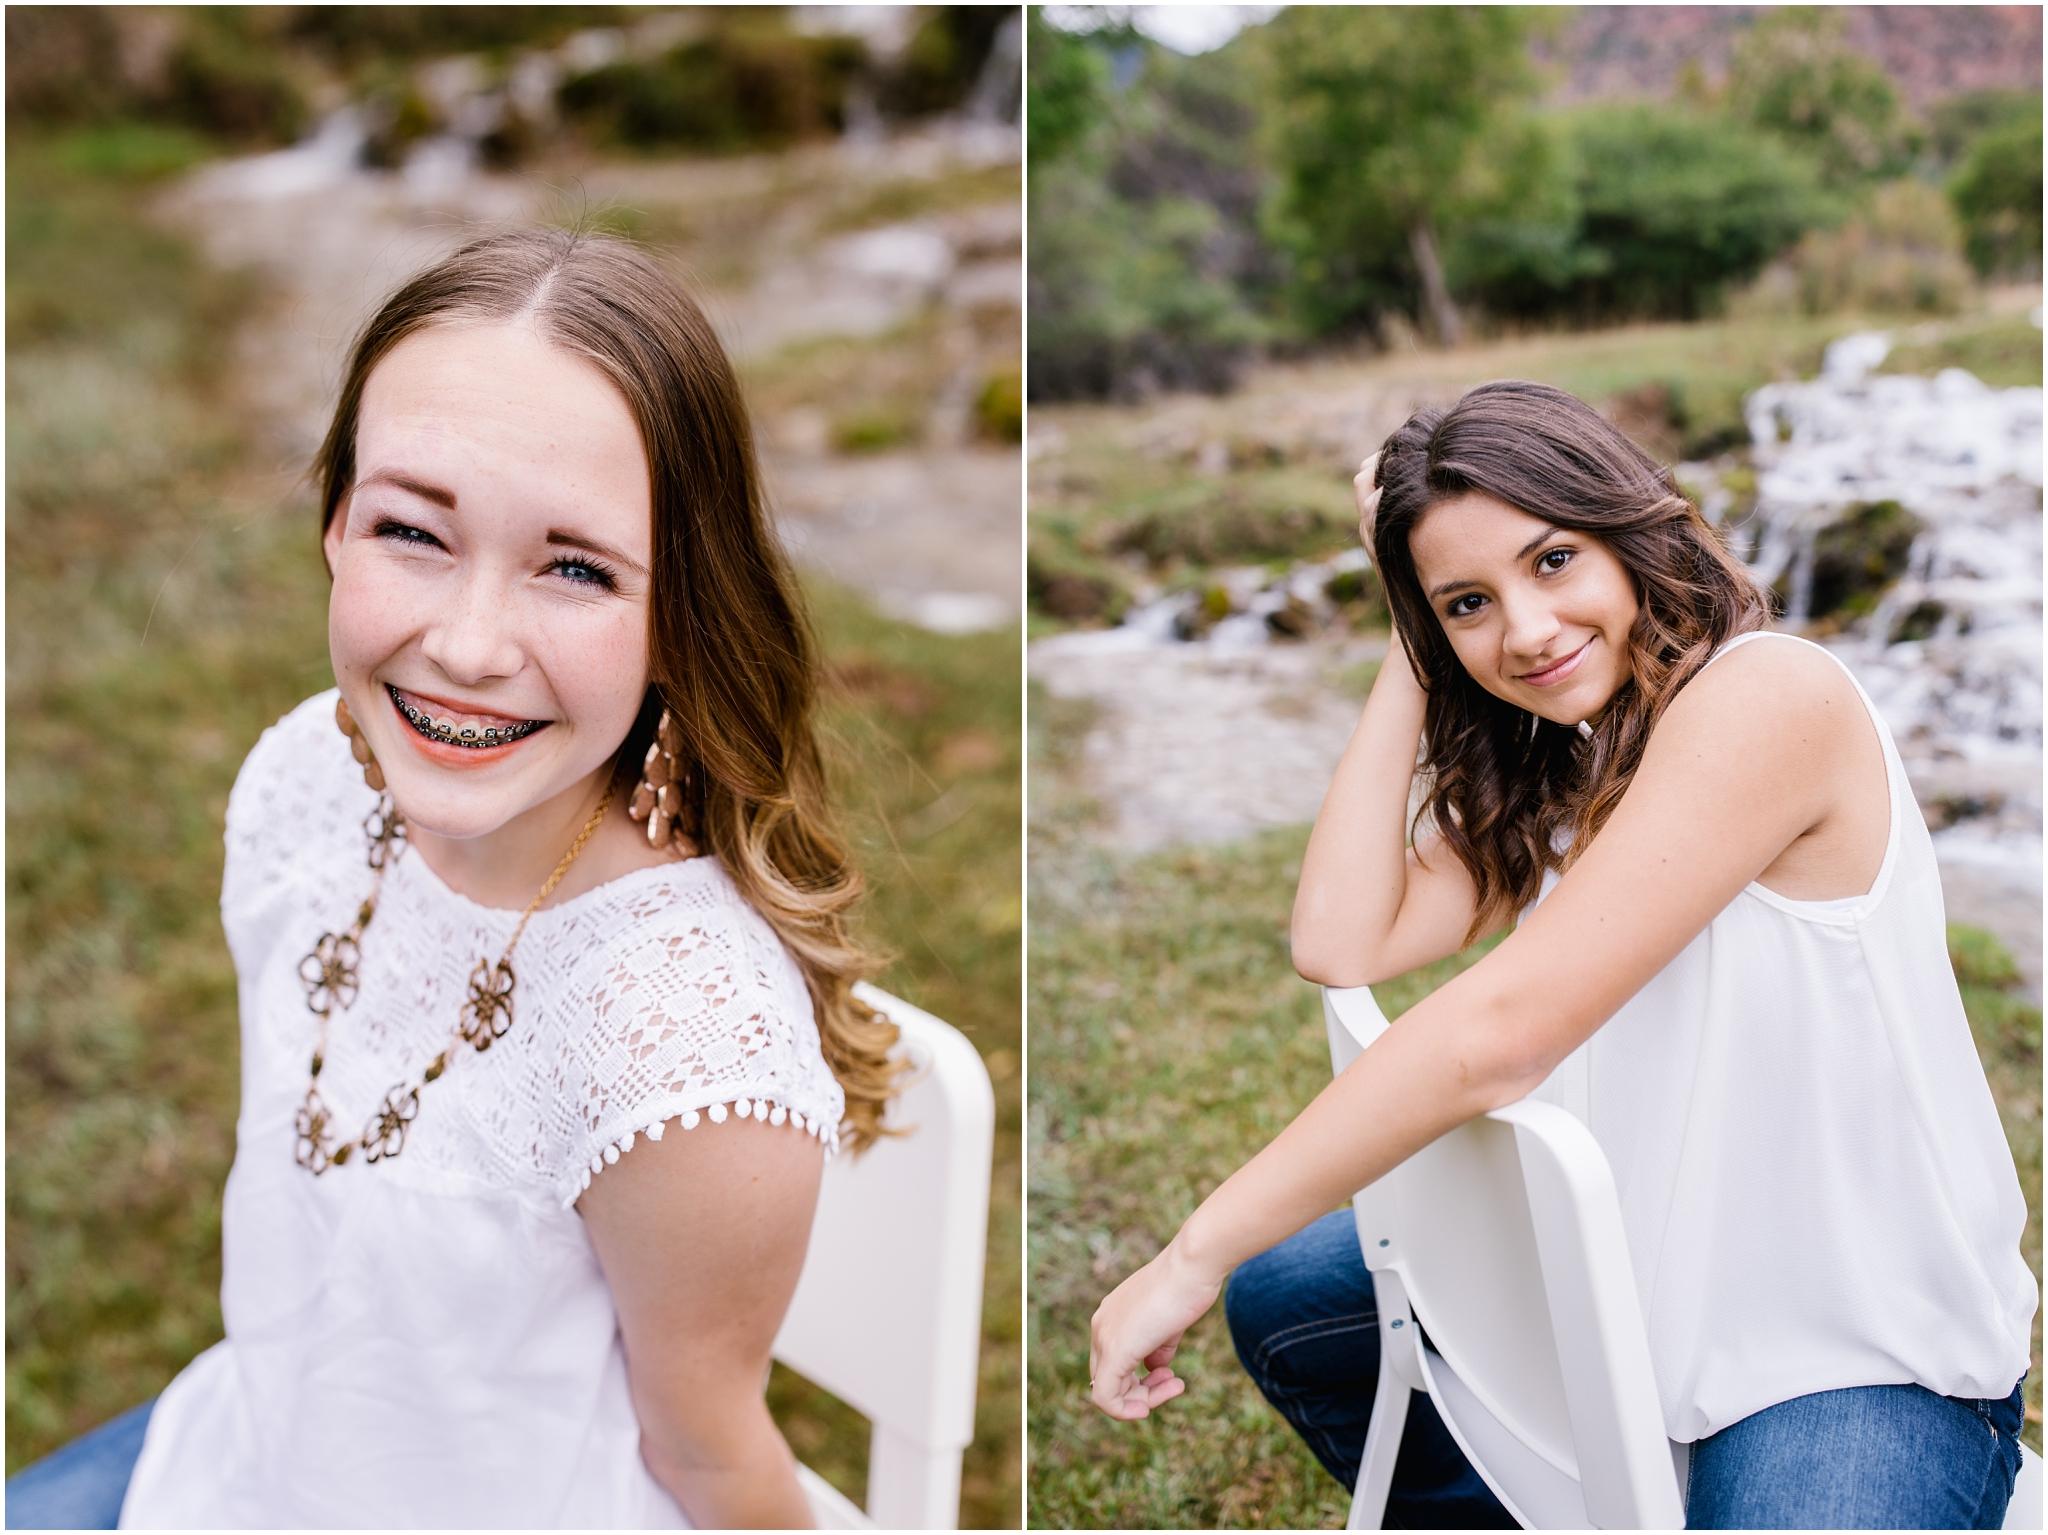 GVHSDRILL-59_Lizzie-B-Imagery-Utah-Family-Photographer-Central-Utah-Park-City-Salt-Lake-City-Drill-Team-Photography-Dance.jpg